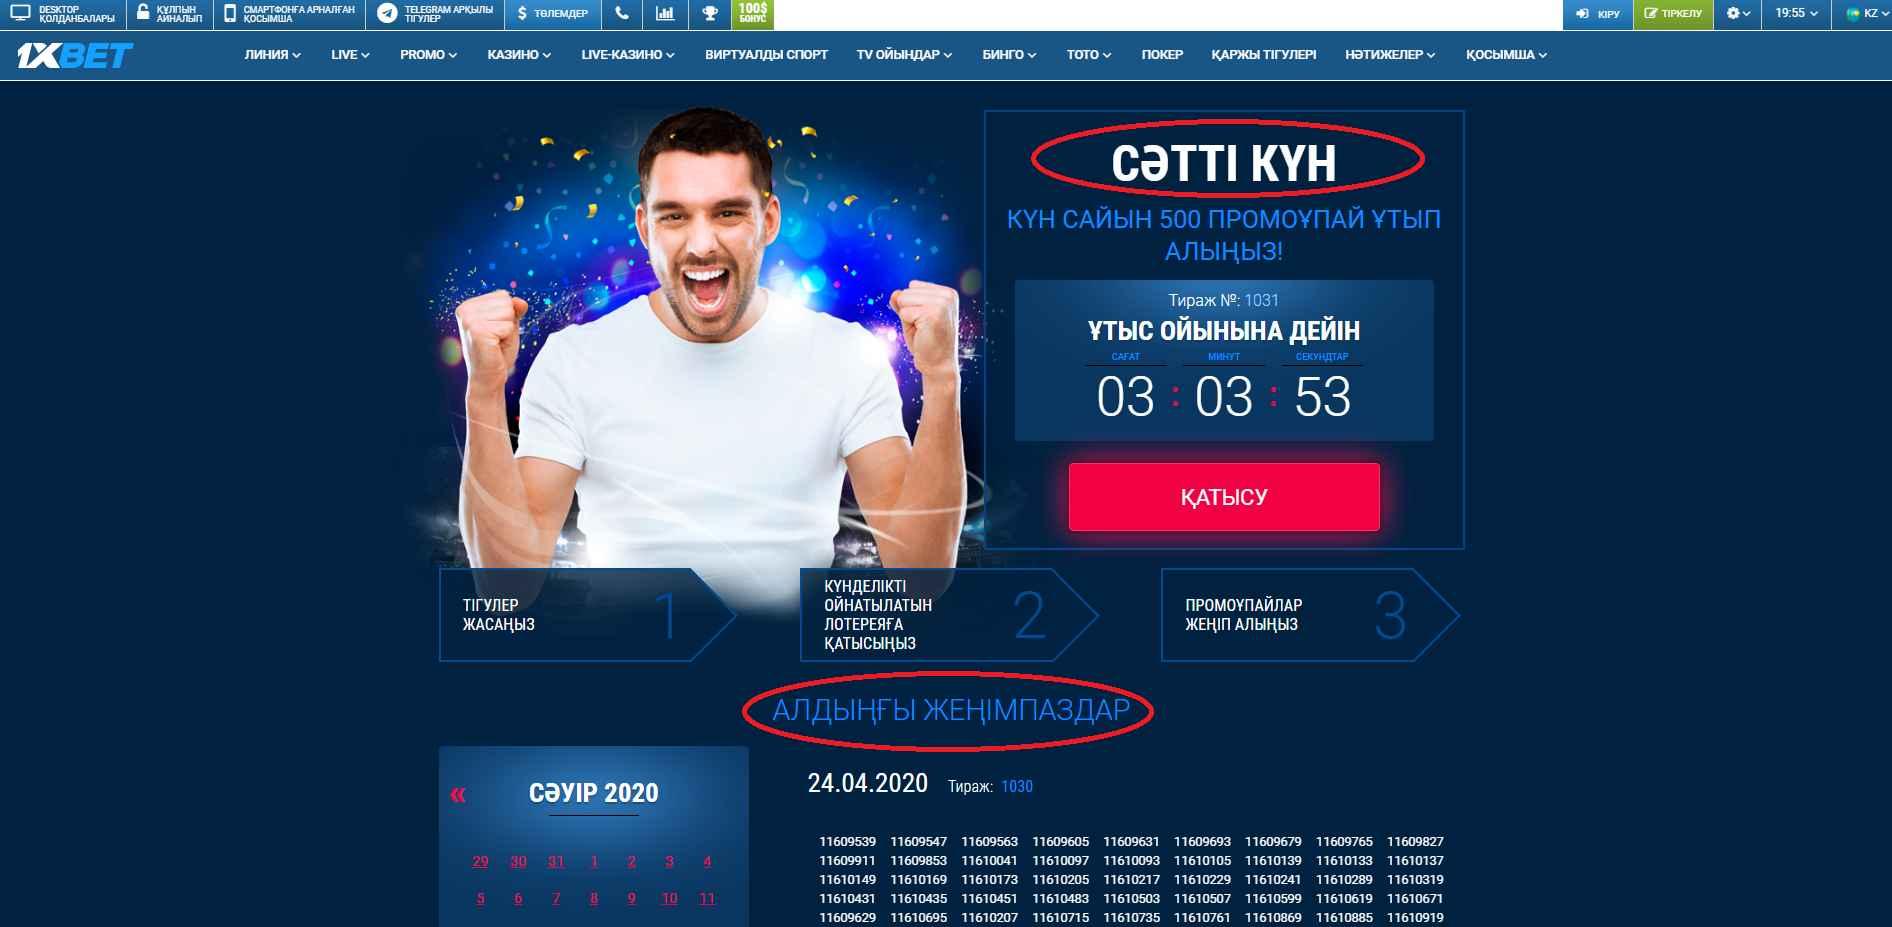 1xbet промокод при регистрации - 55000 тенге на онлайн ставки